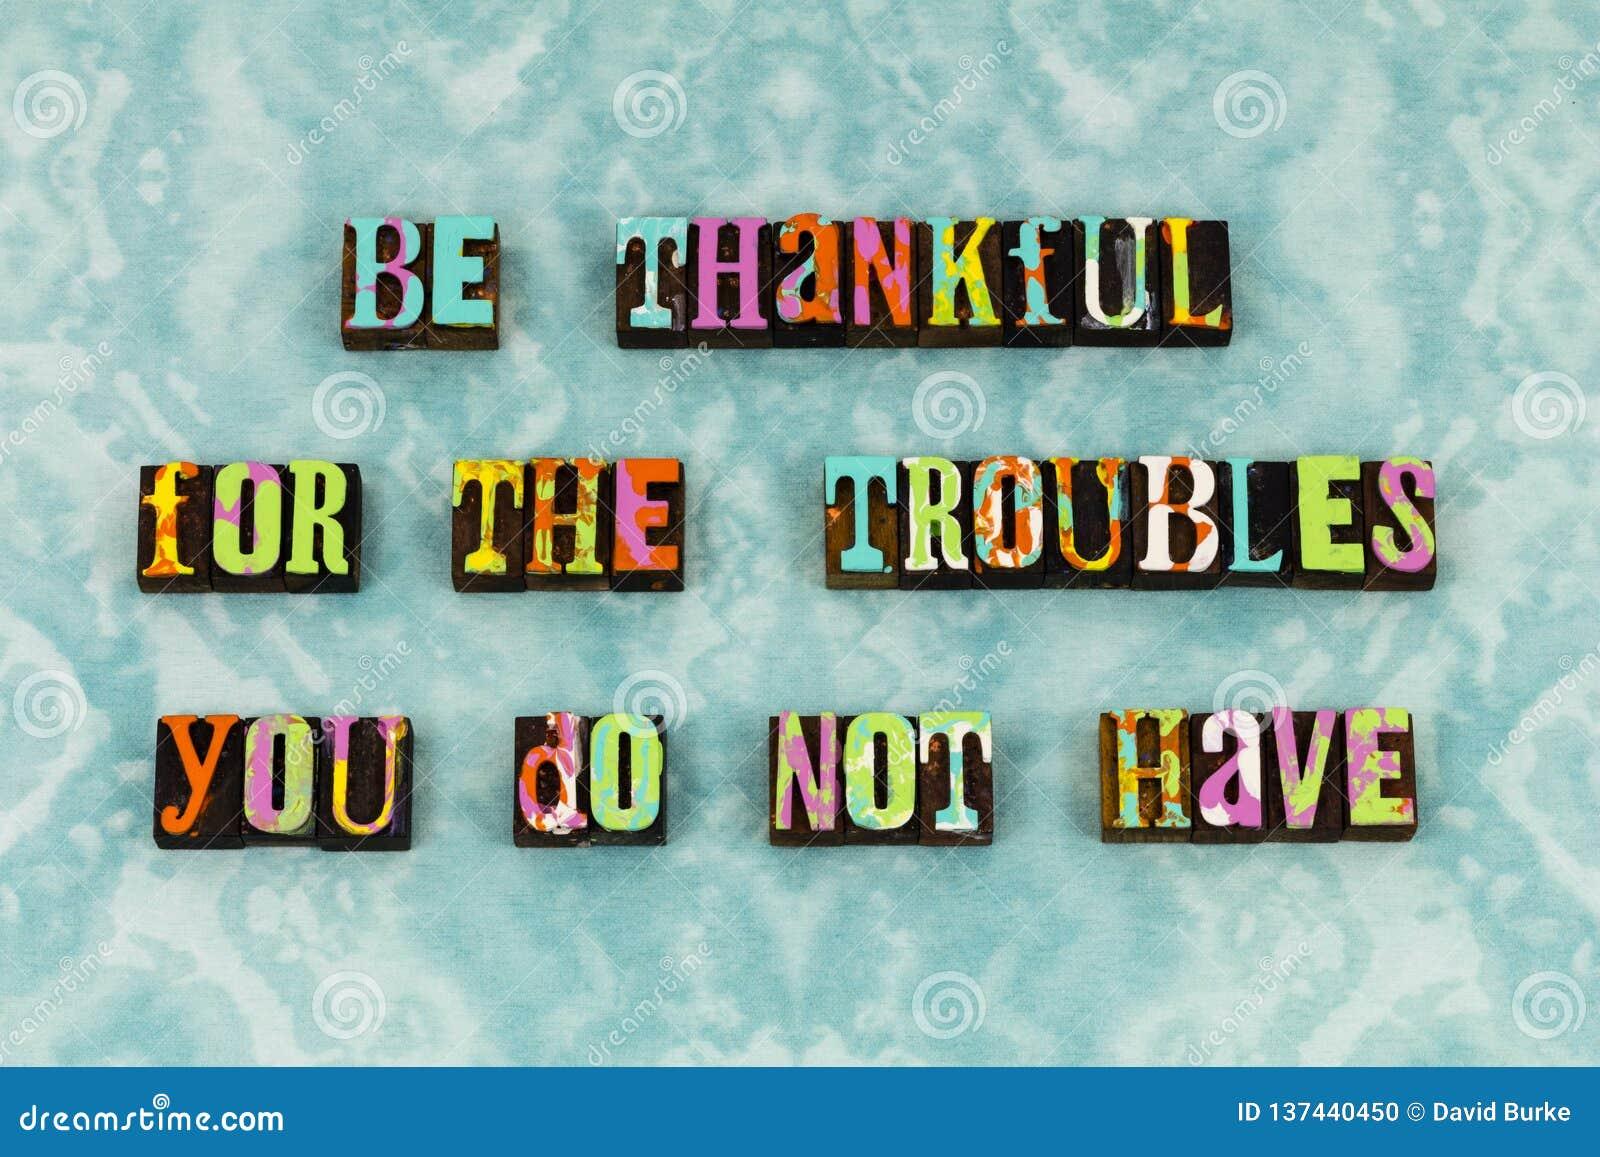 Thankful grateful blessed trouble joy letterpress